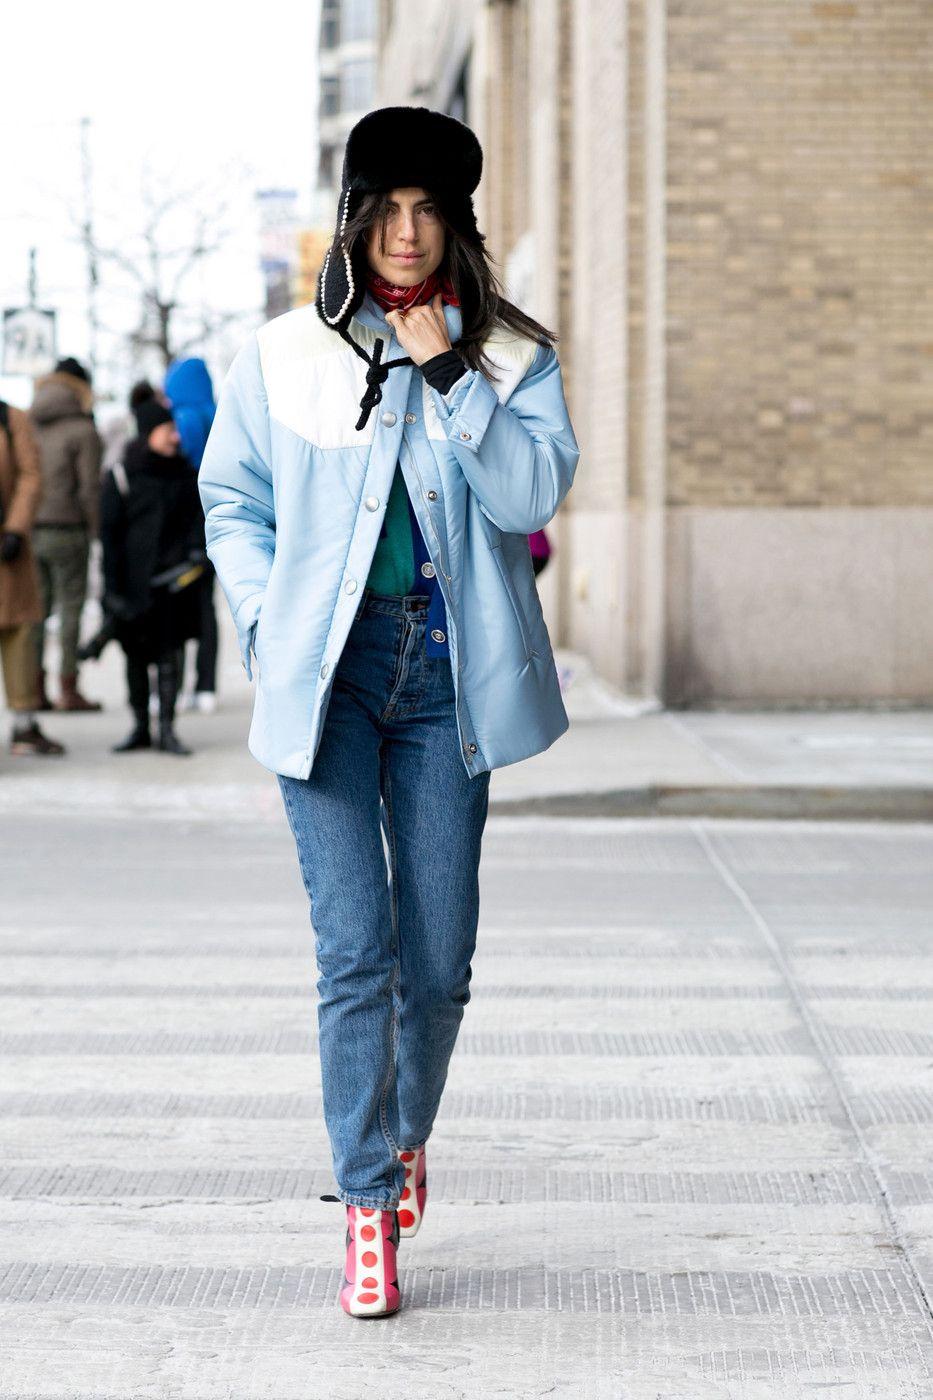 #LeandraMedine in Valentino booties. NYC